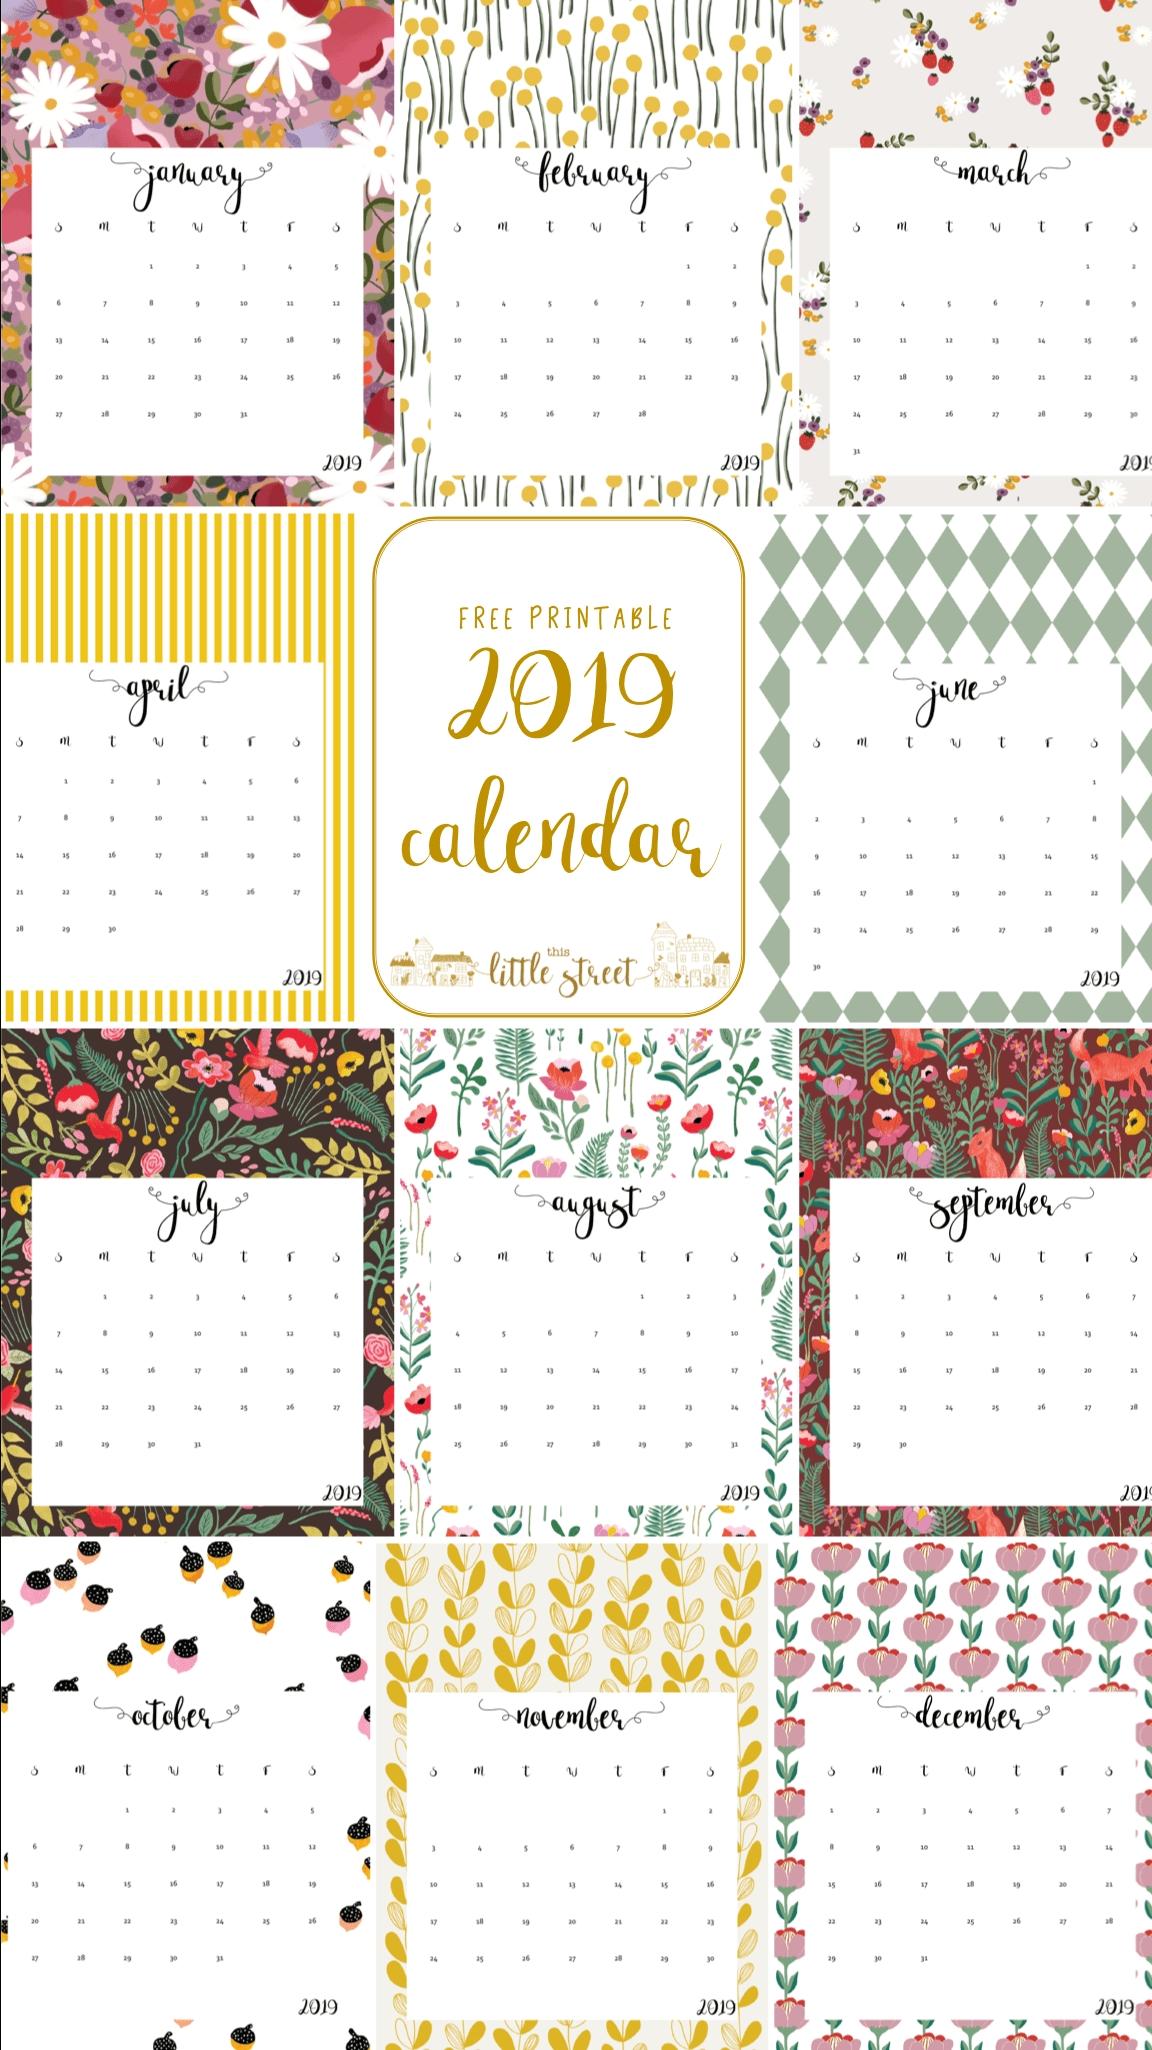 20 free printable calendars for 2020 yesmissy | free